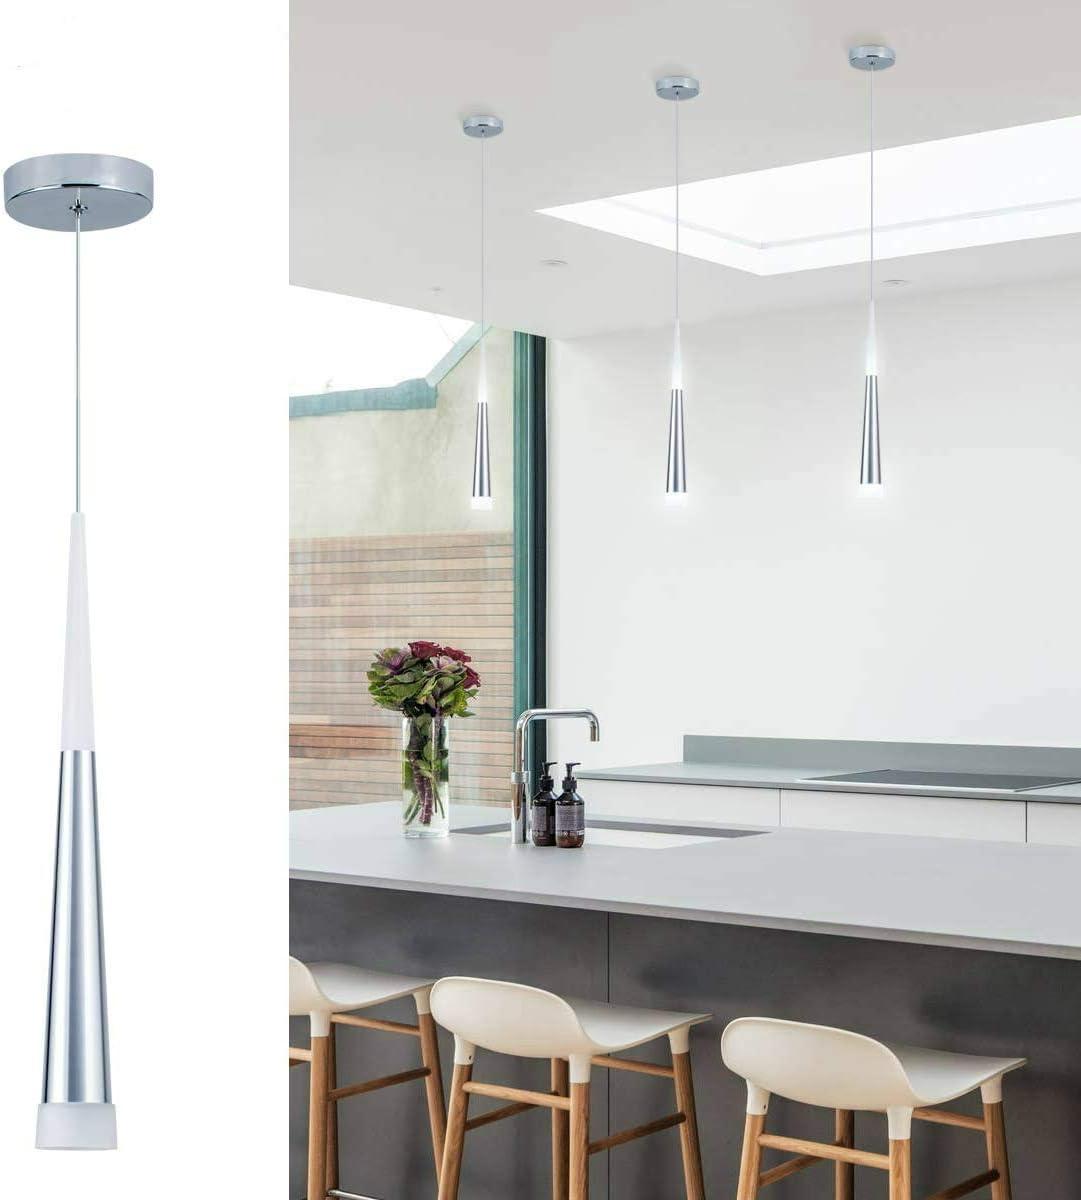 Bewamf Mini Pendant Light Silver Finish with Acrylic Shade LED Cone  Adjustable Modern Pendant Lighting for Kitchen Island Dining Room Bar,Warm  White ...